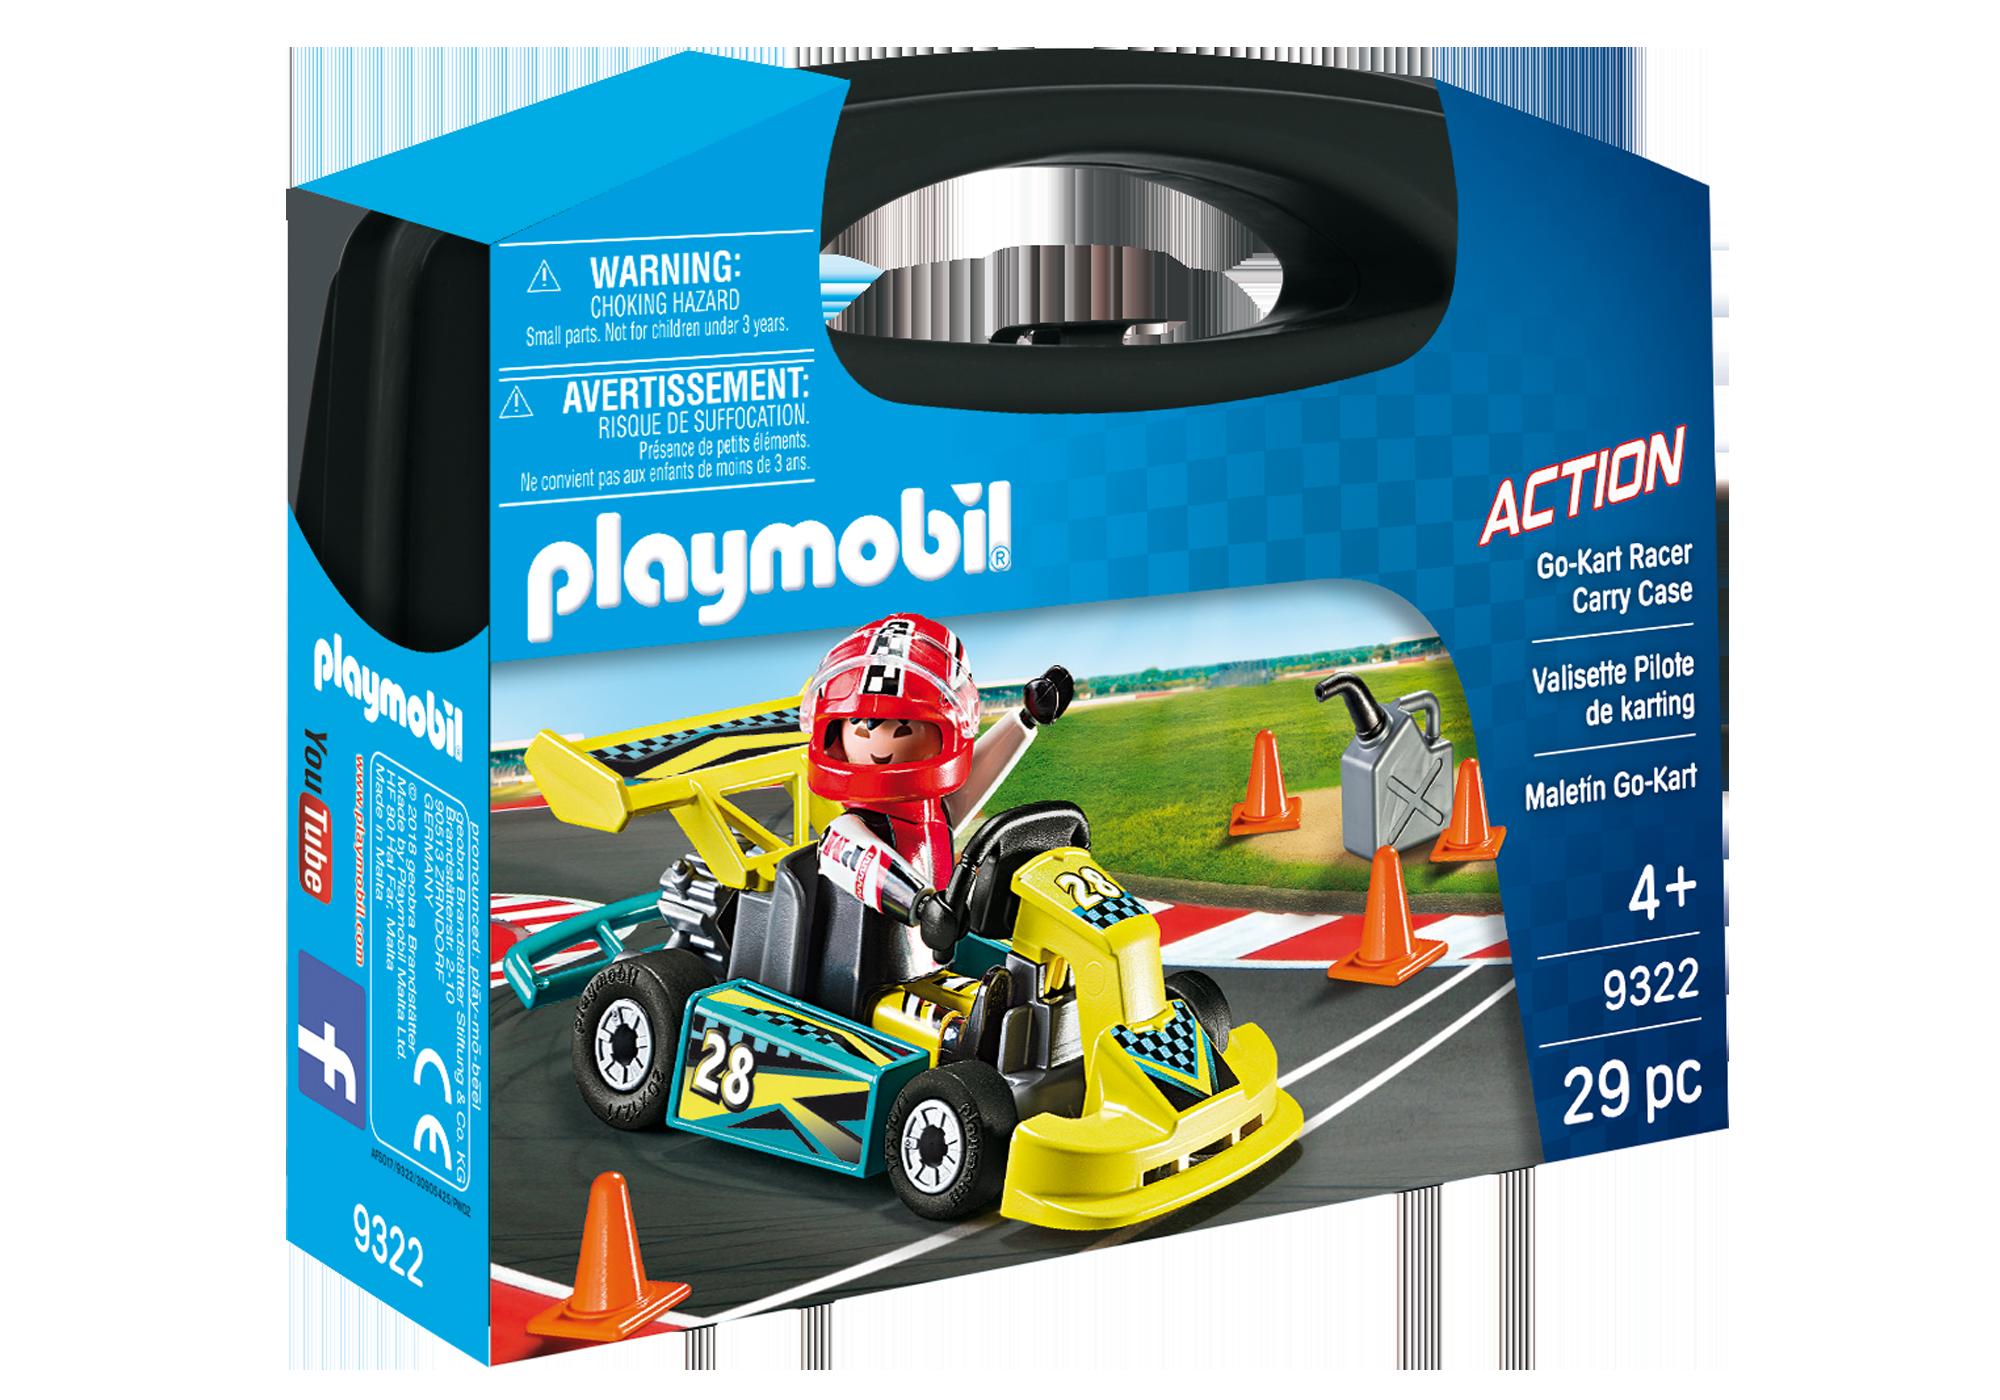 http://media.playmobil.com/i/playmobil/9322_product_box_front/Go-Kart Racer Carry Case